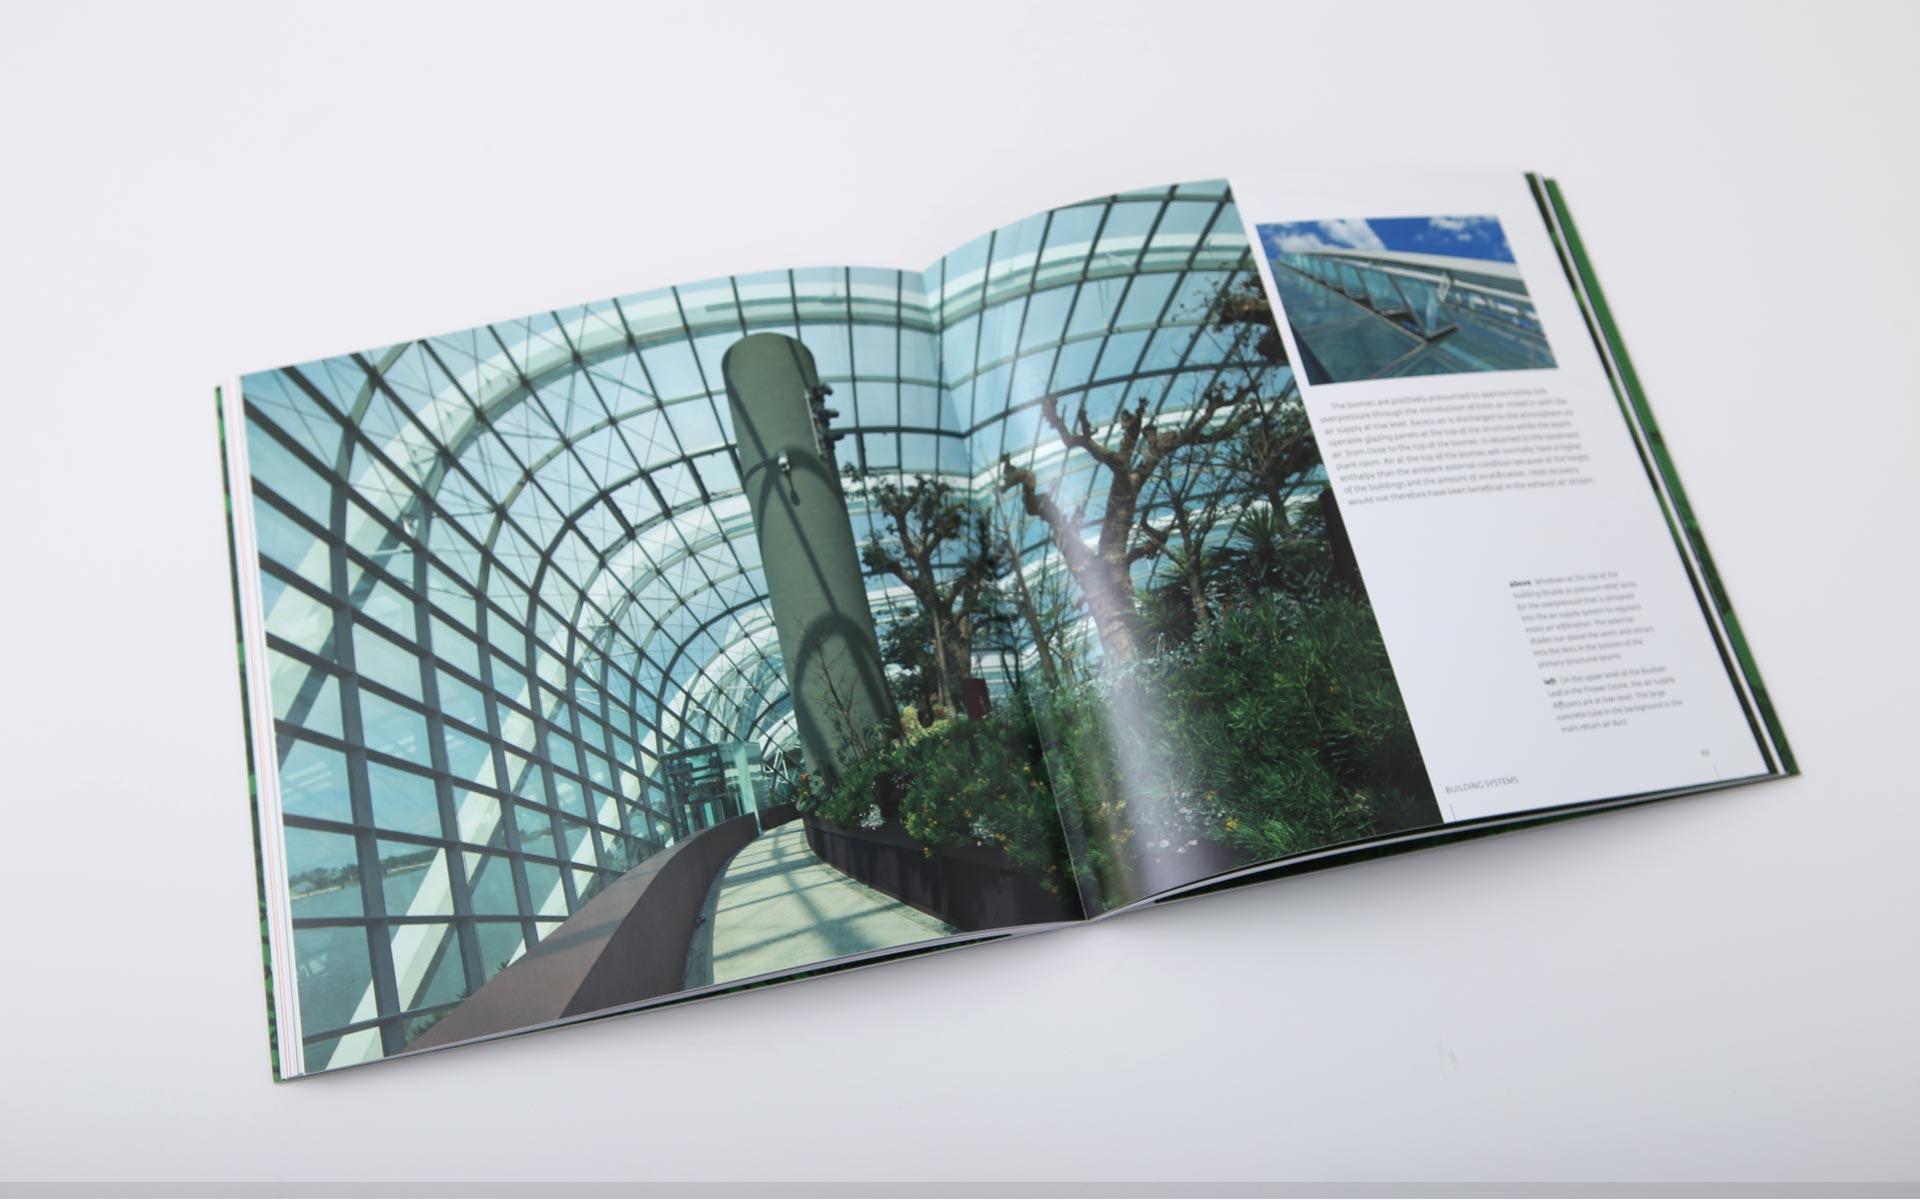 atelier-ten-book-design-5